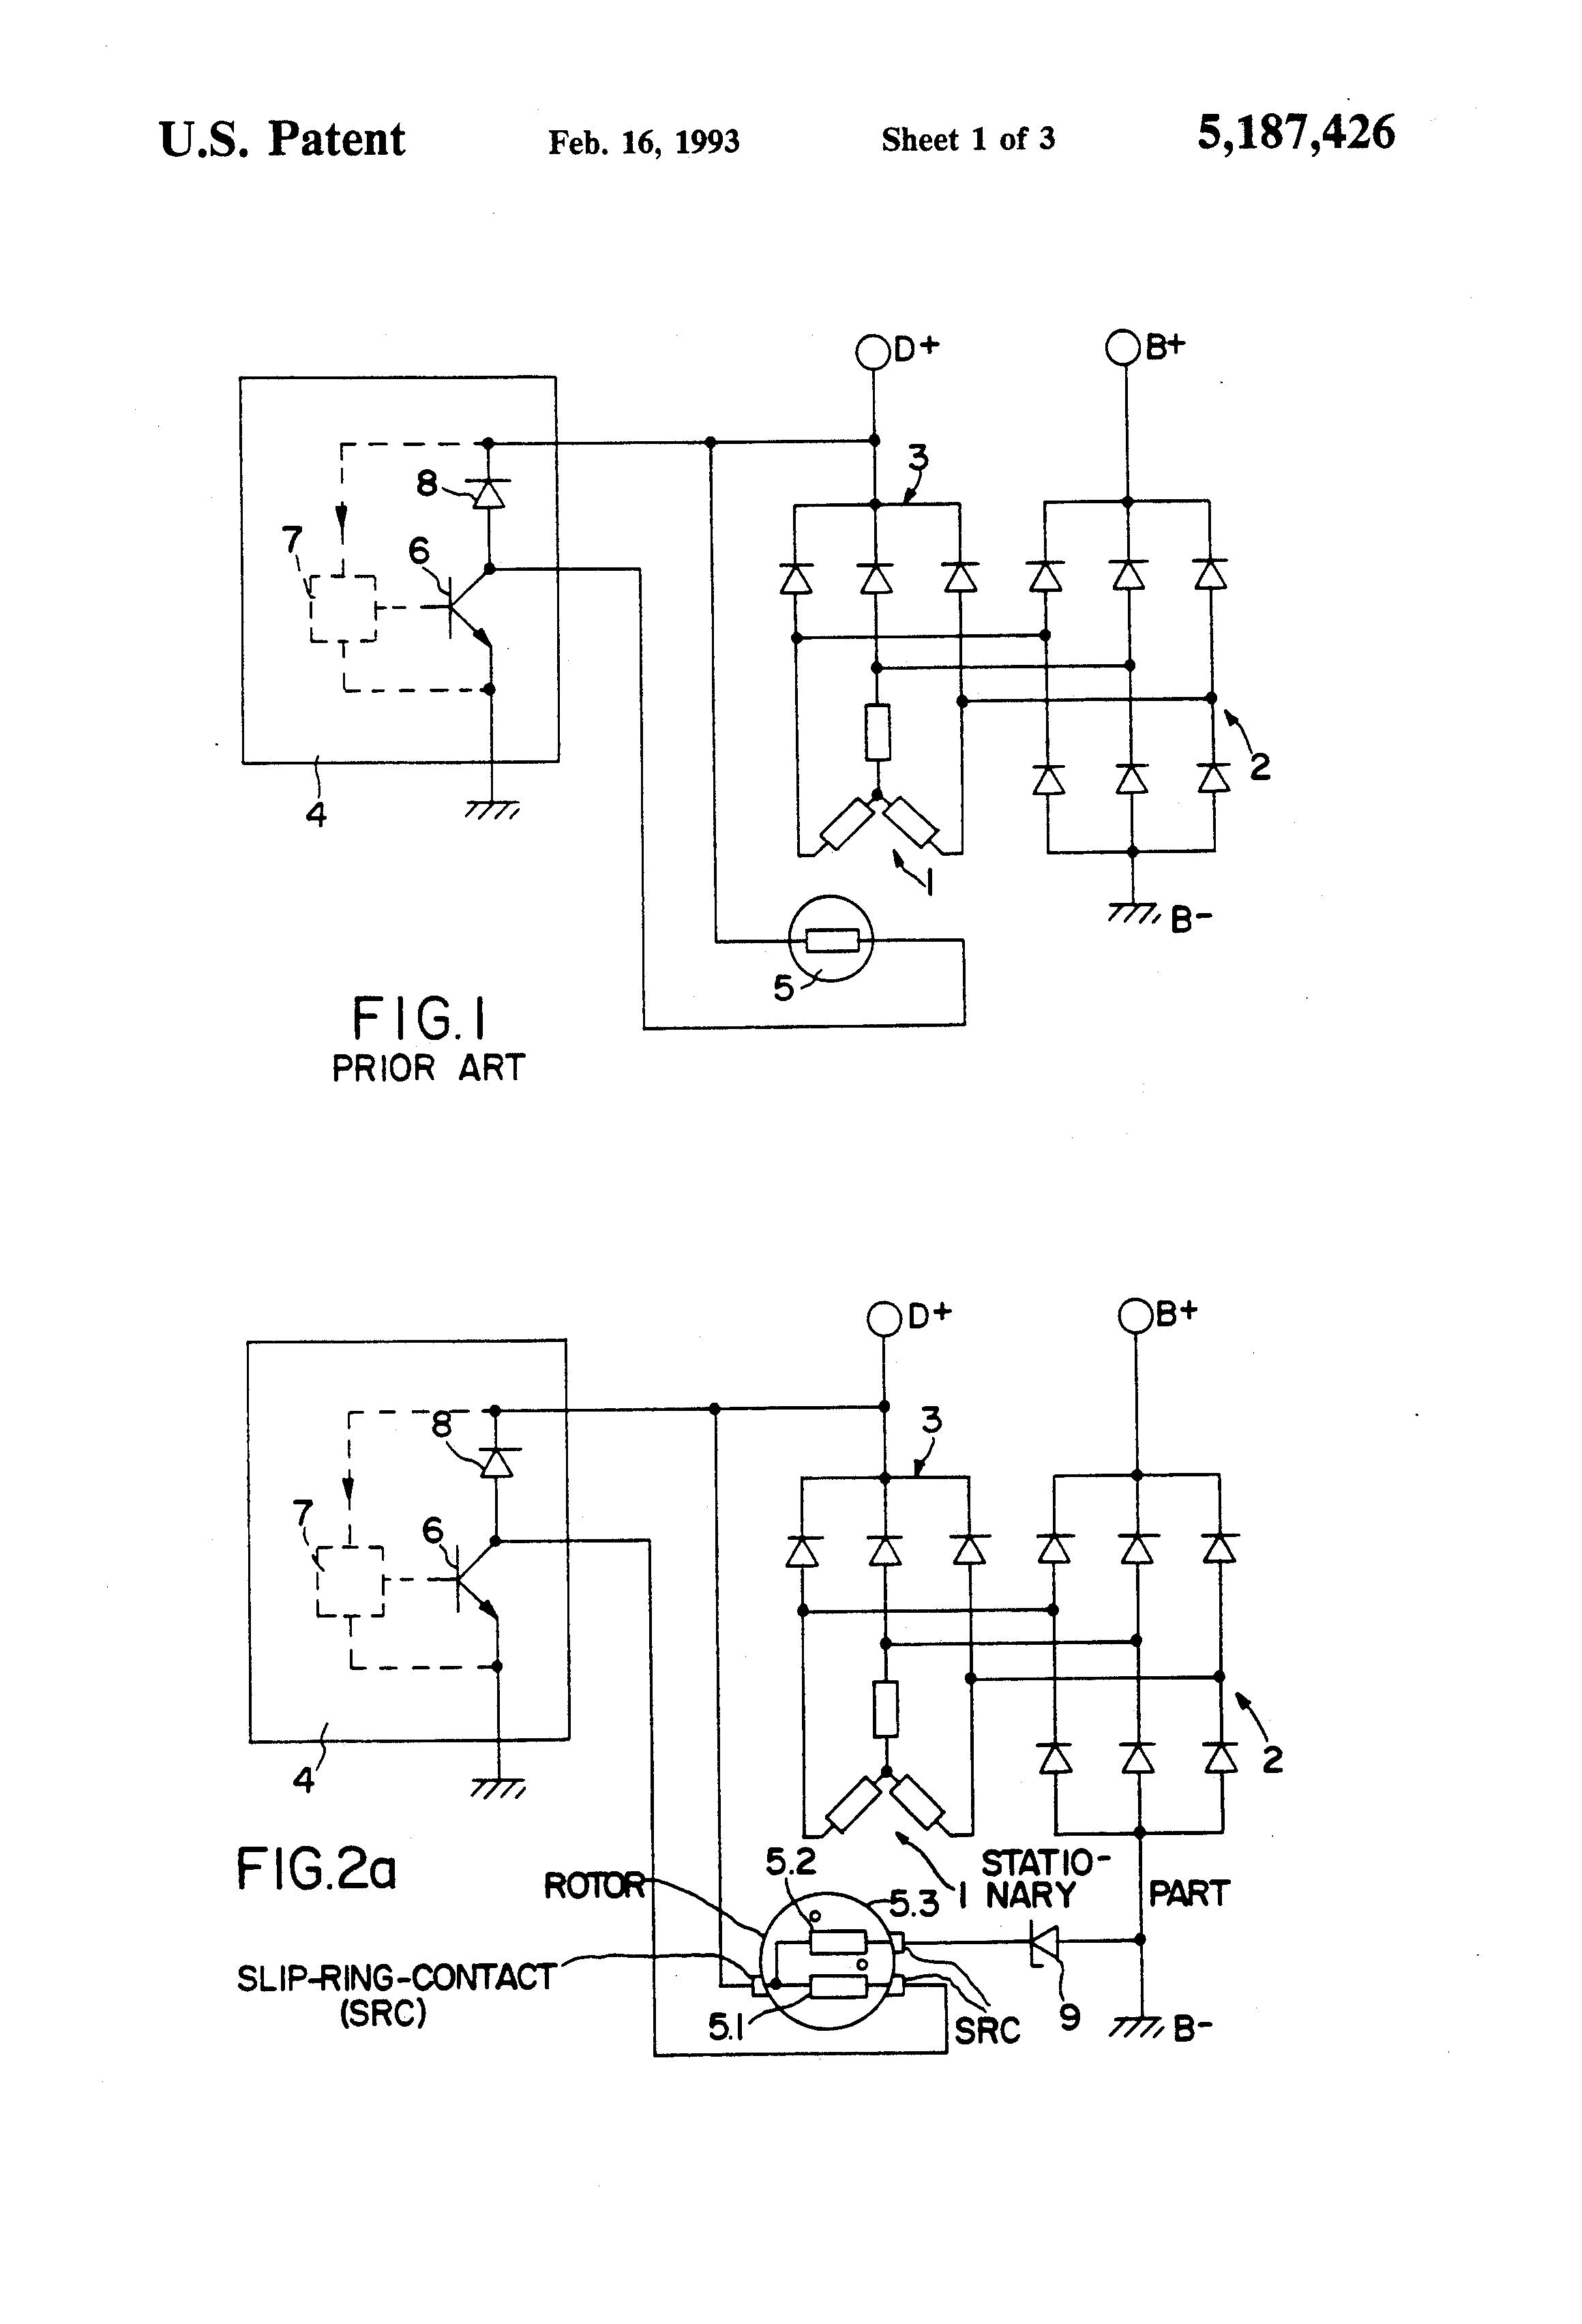 Electrical Wiring Diagram Pdf Car Alternator Wiring Diagram Pdf New Electrical Wiring Diagram for Alternator